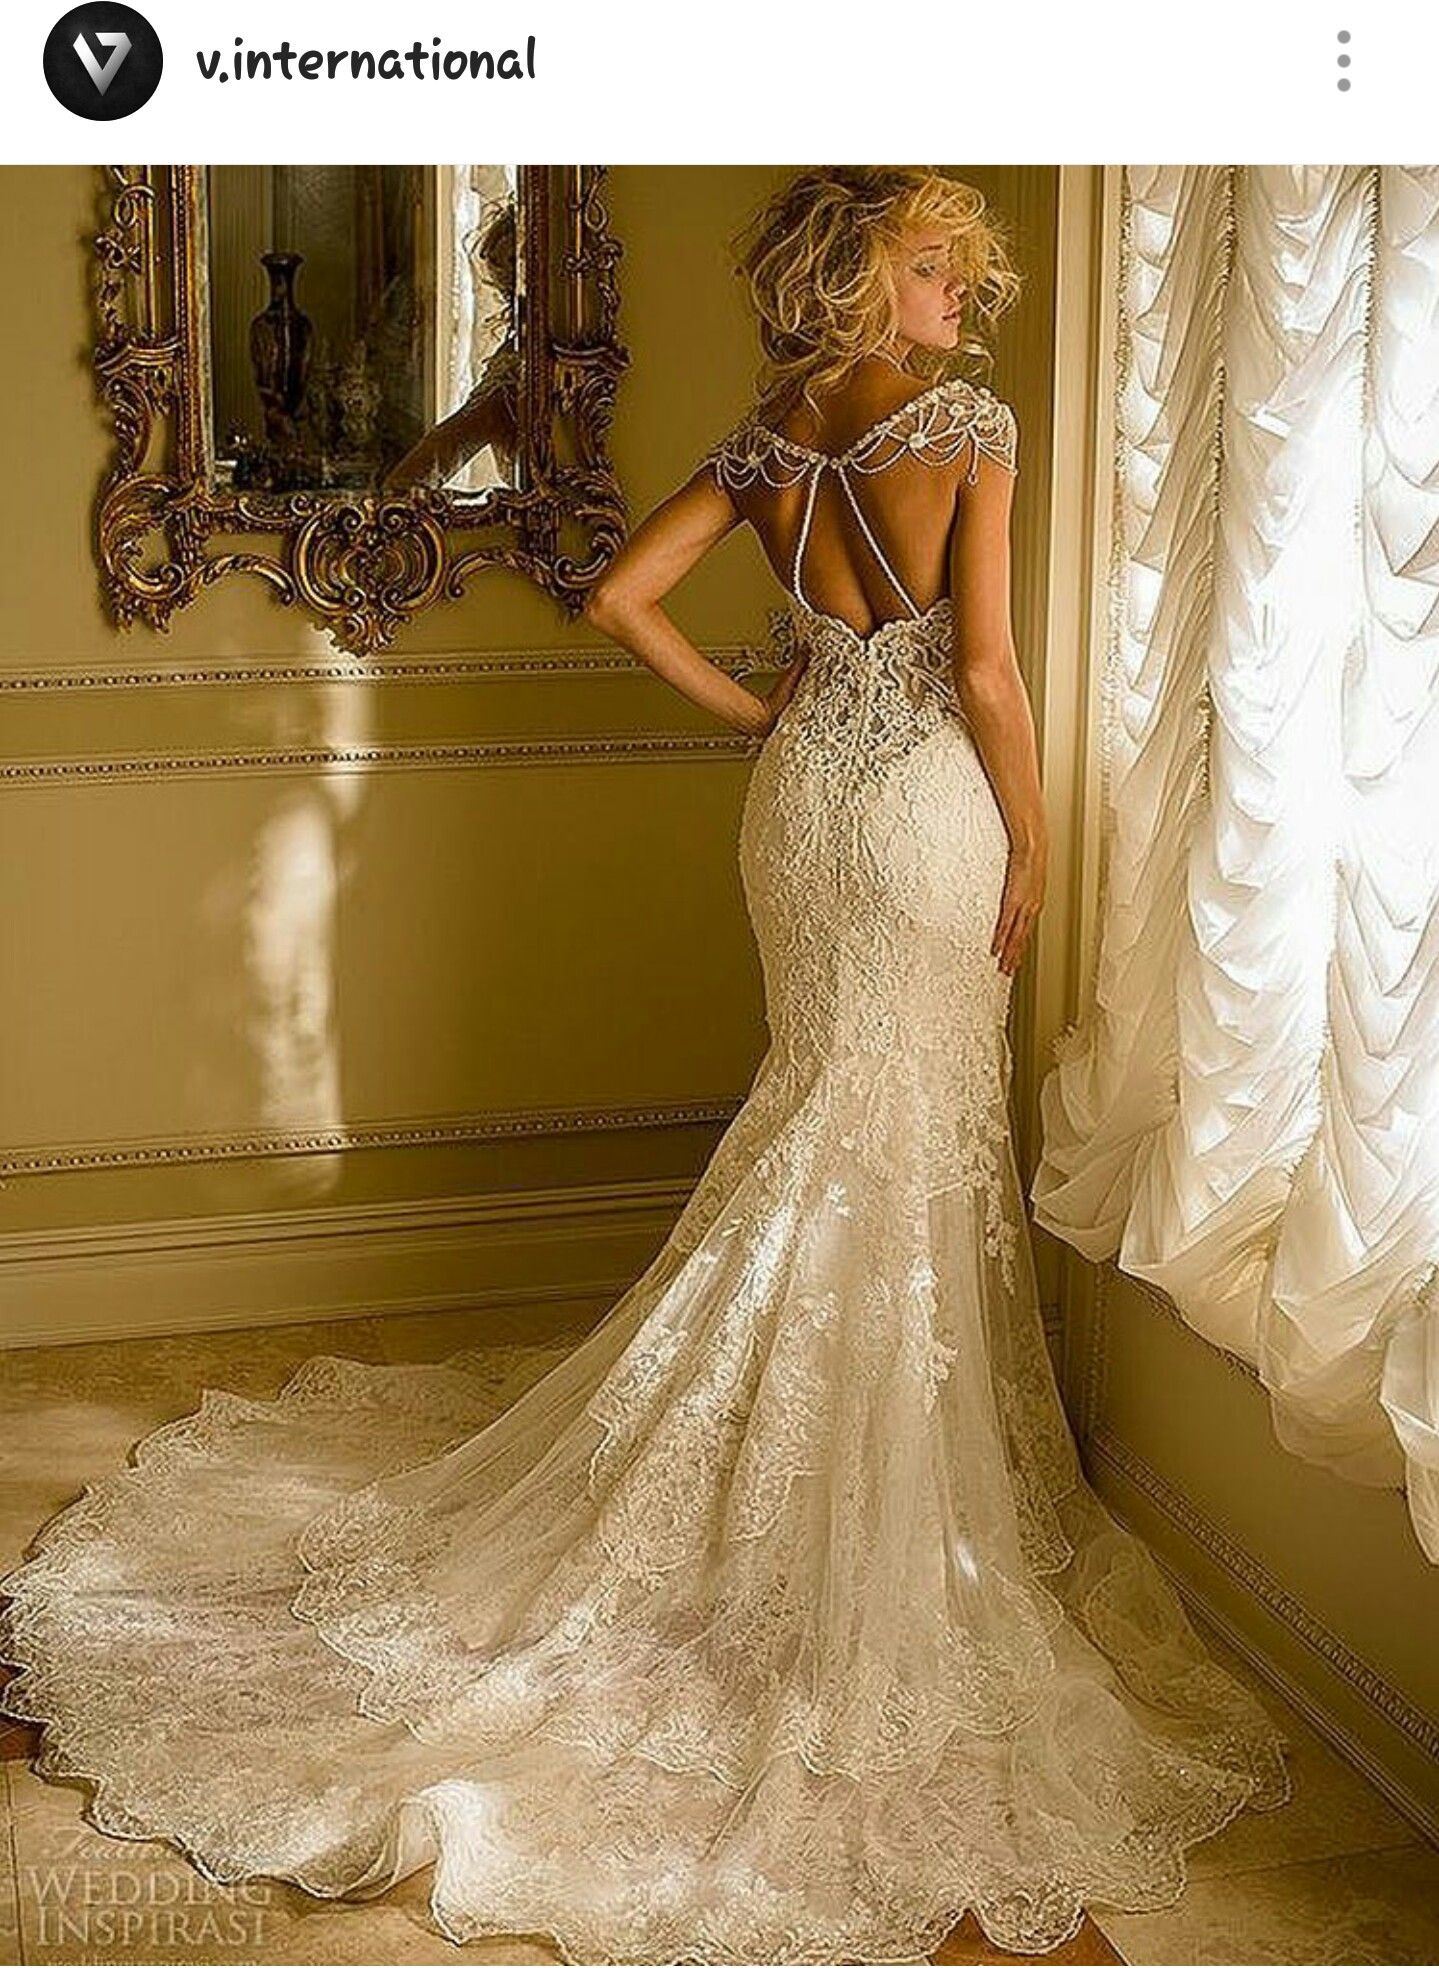 Wedding dresses for large busts  imagen de instagram vogue international  Trajes de novias y algo